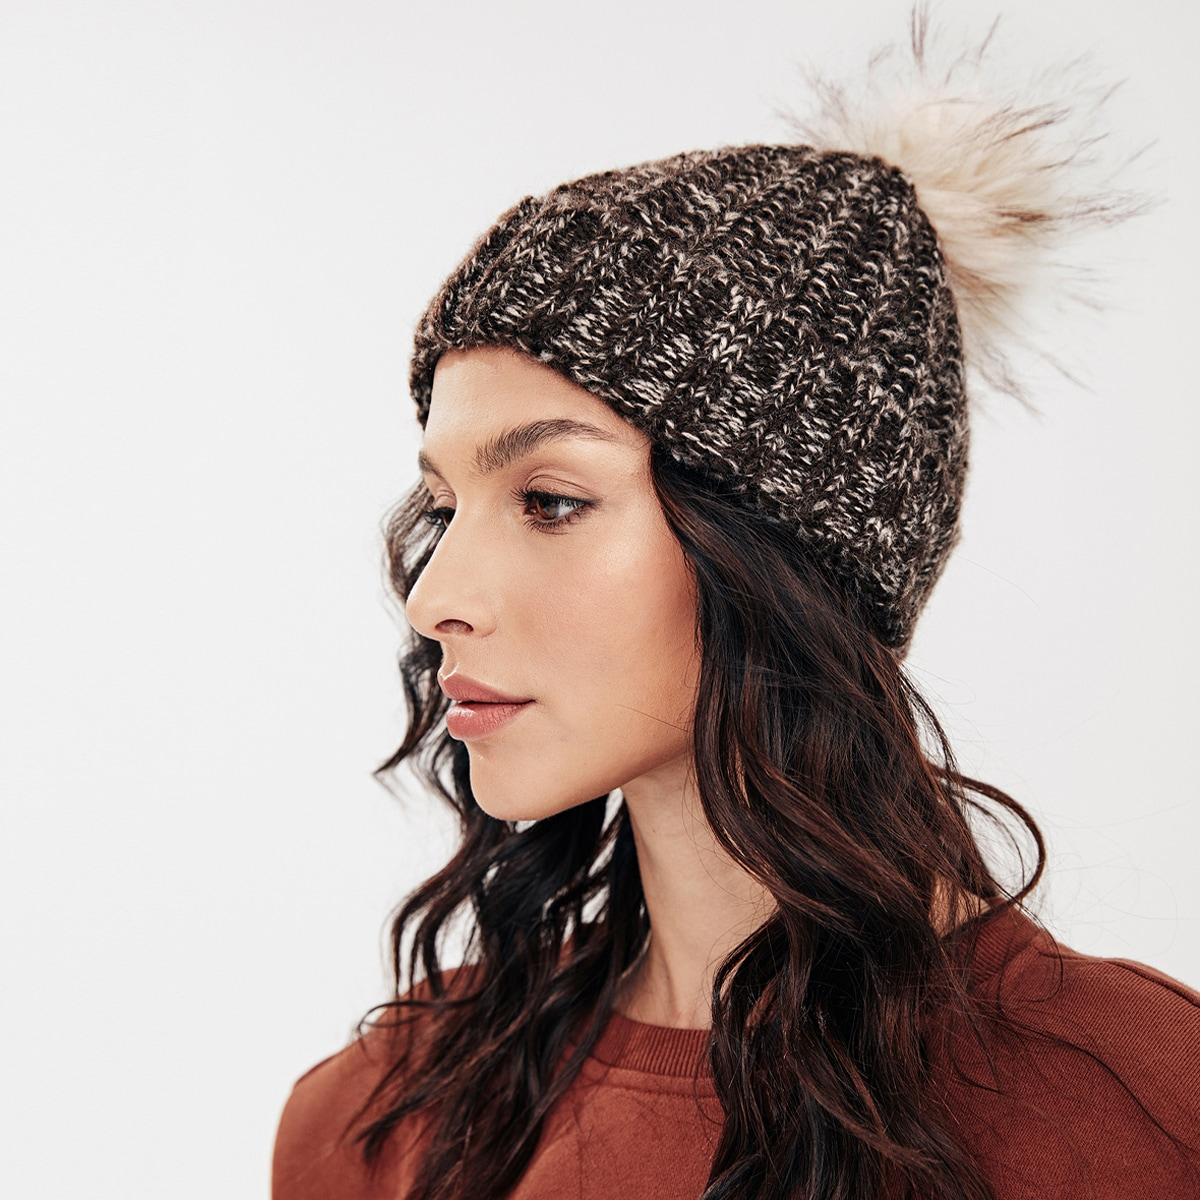 Вязаная шапка-бини с помпоном